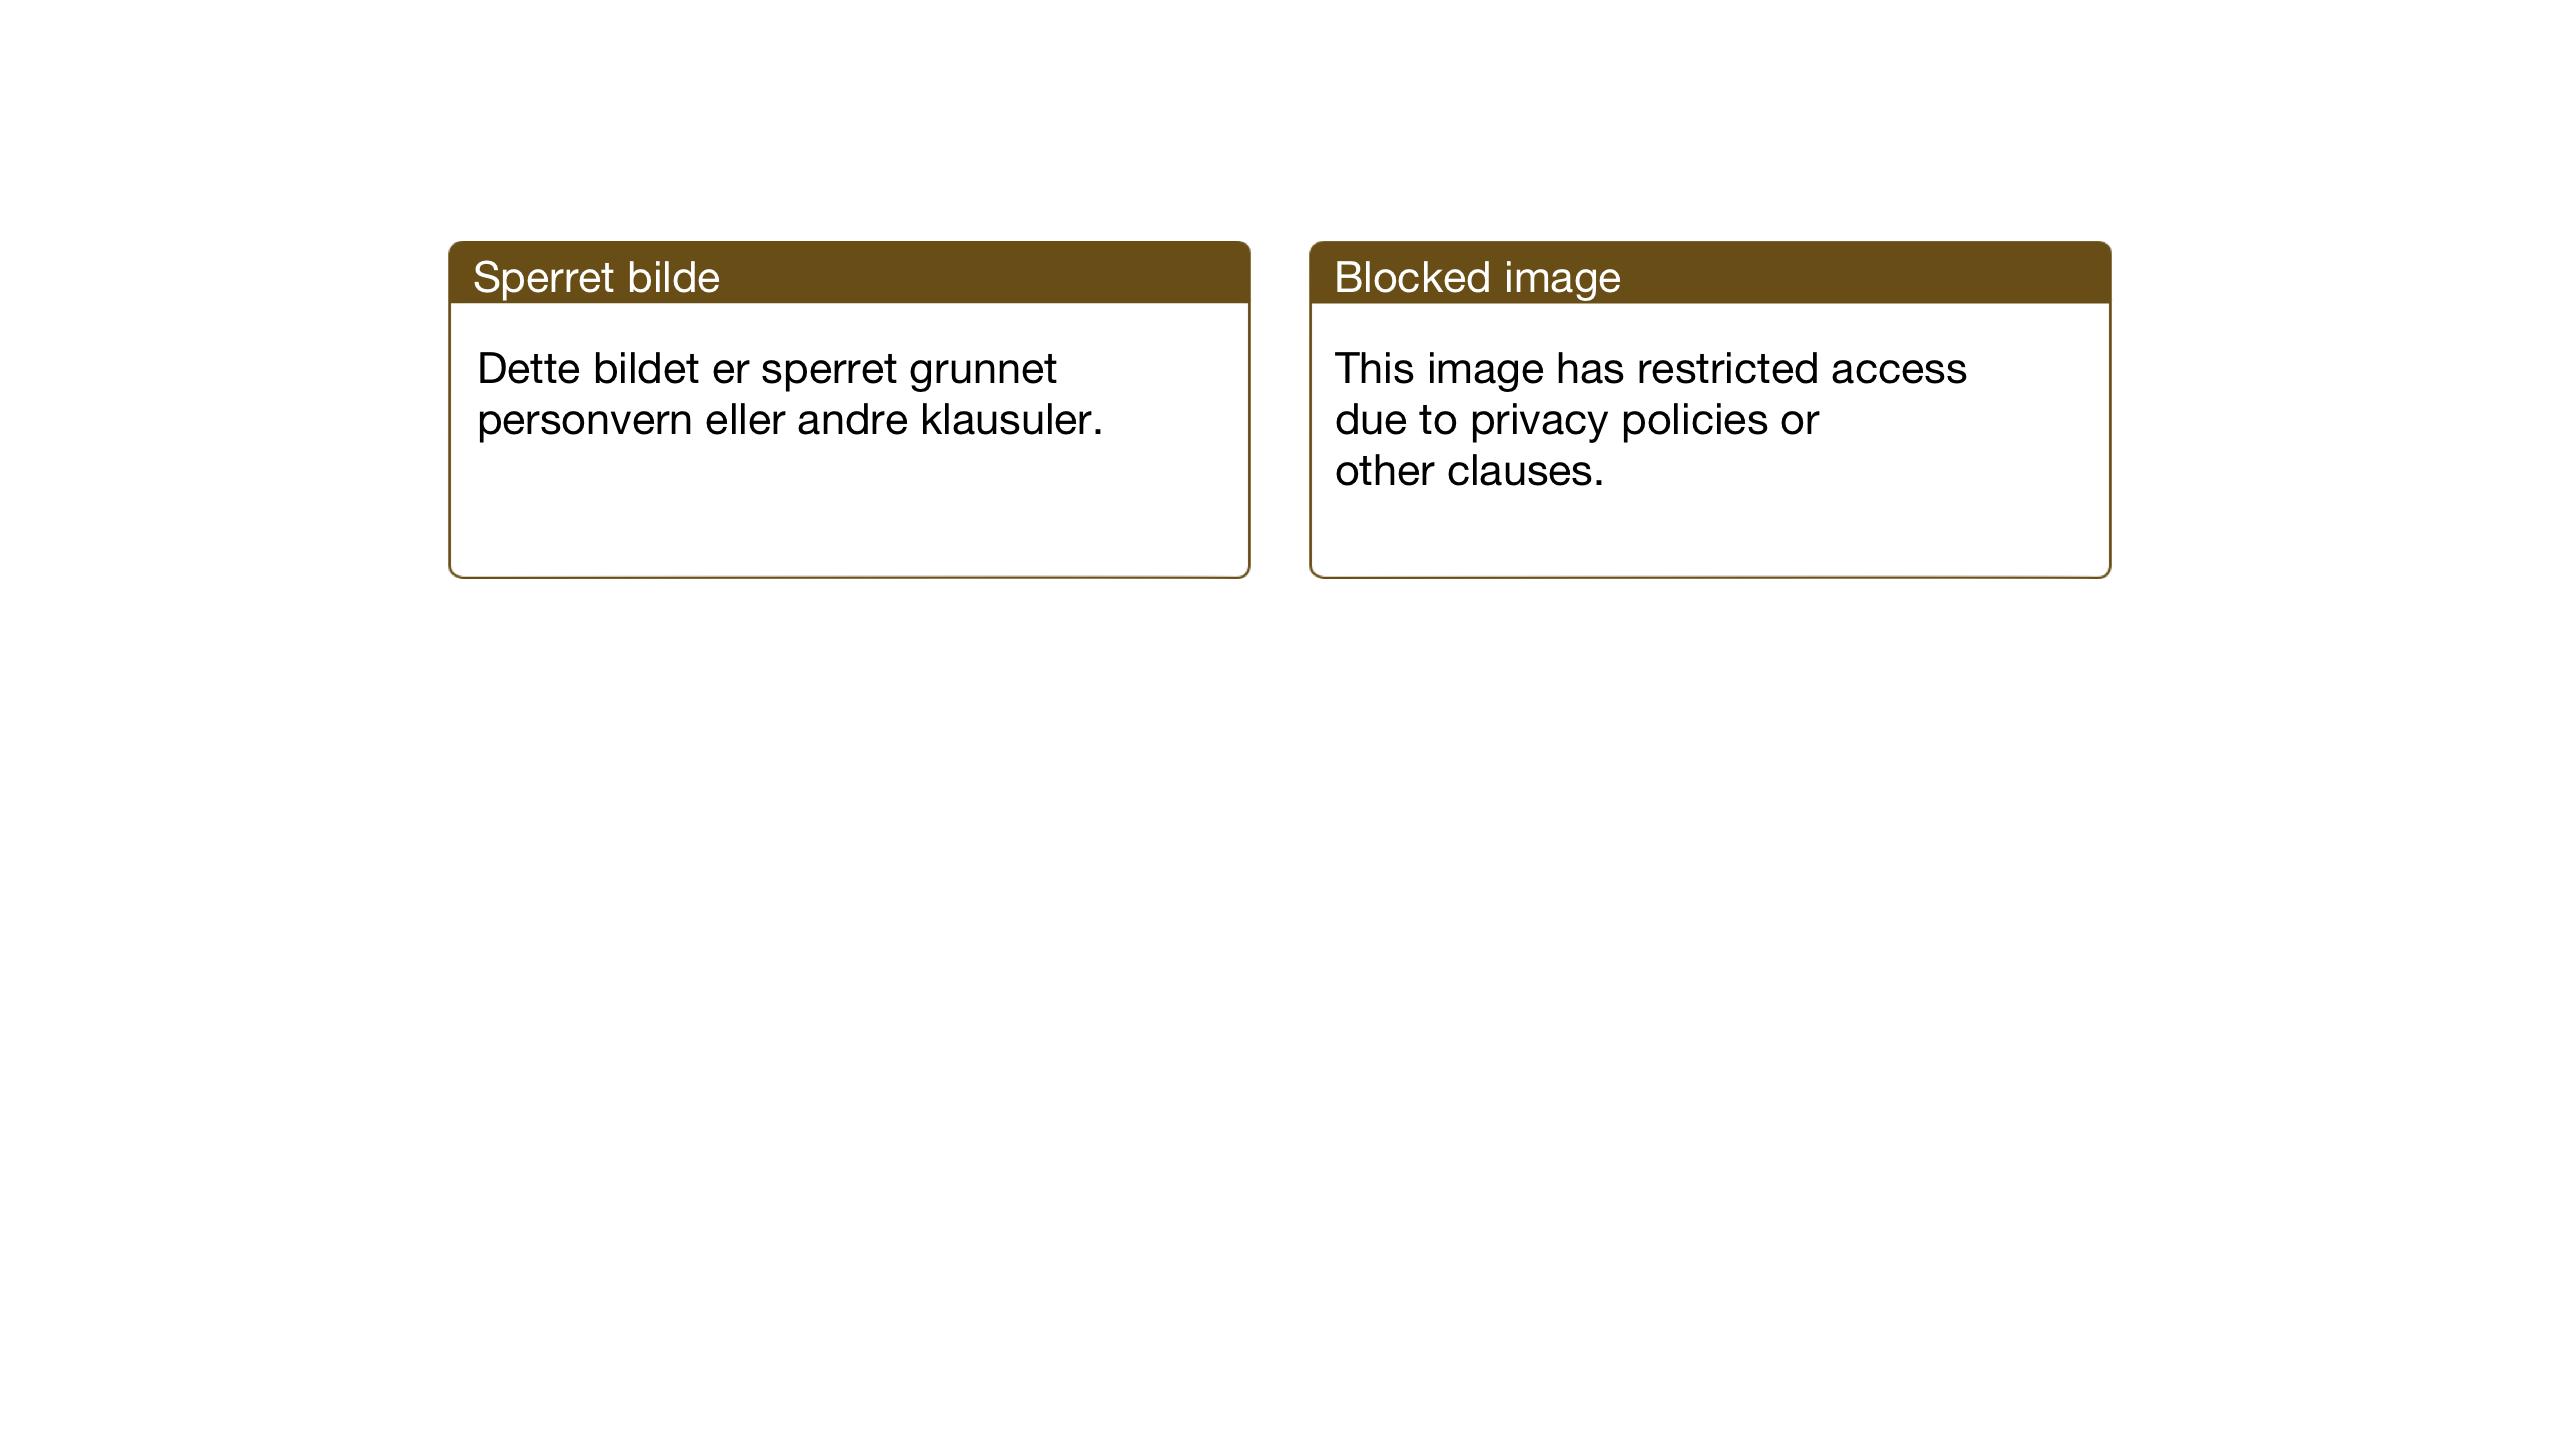 SAH, Vardal prestekontor, H/Ha/Haa/L0018: Ministerialbok nr. 18, 1930-1945, s. 73